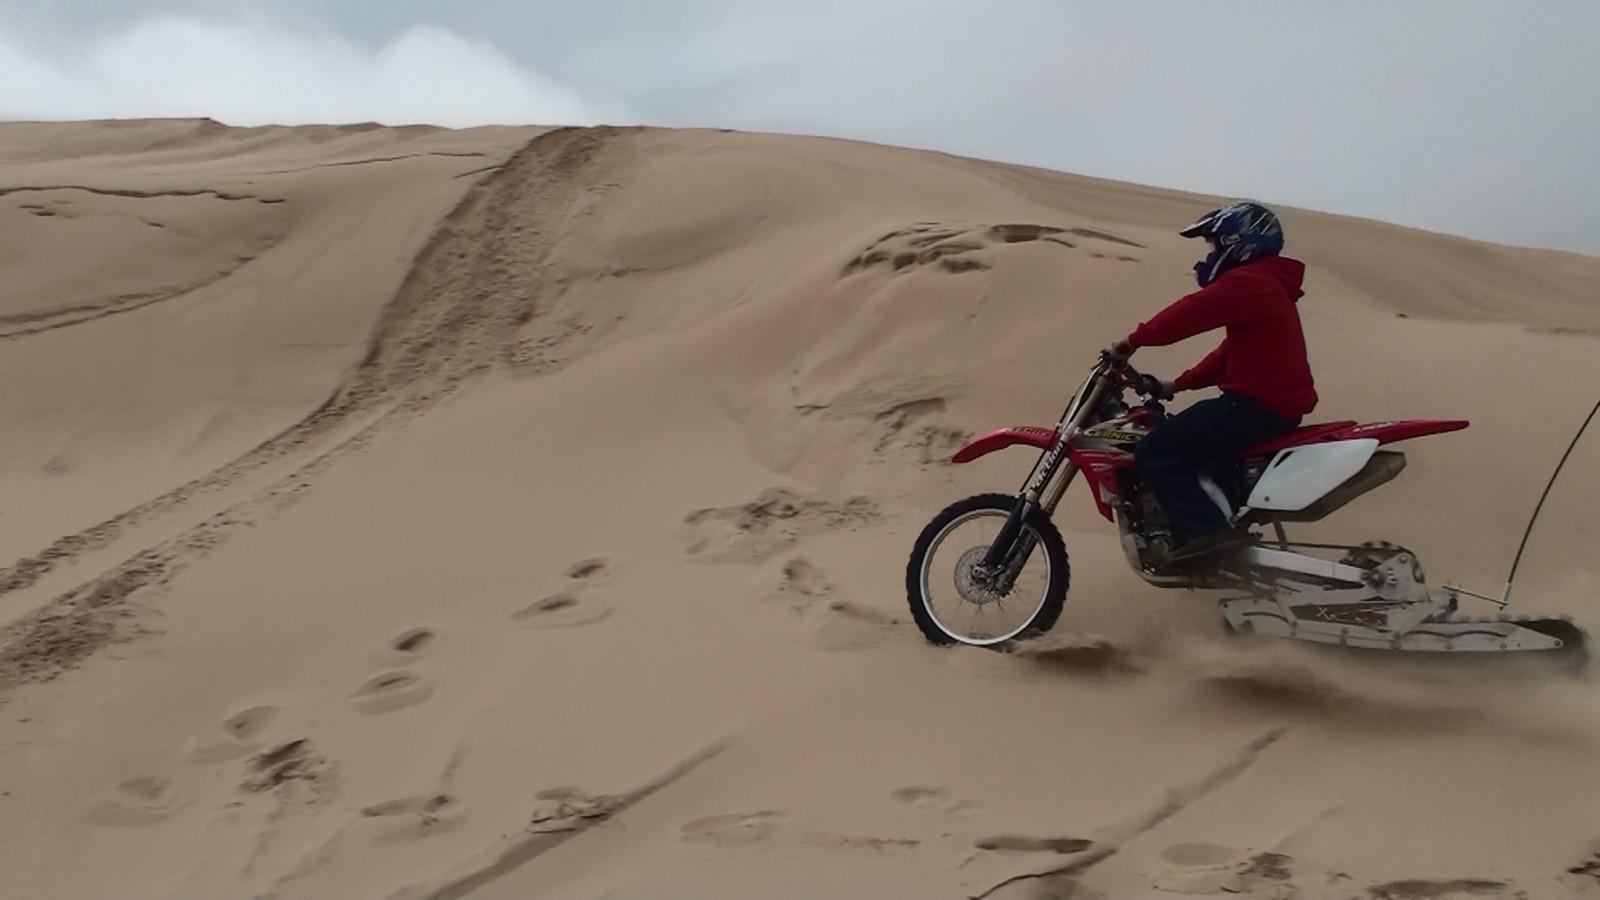 Explorer-snowbike-track-system-for-dirt-bike-supermoto-enduro-mx-AD-Boivin-75-1600x900